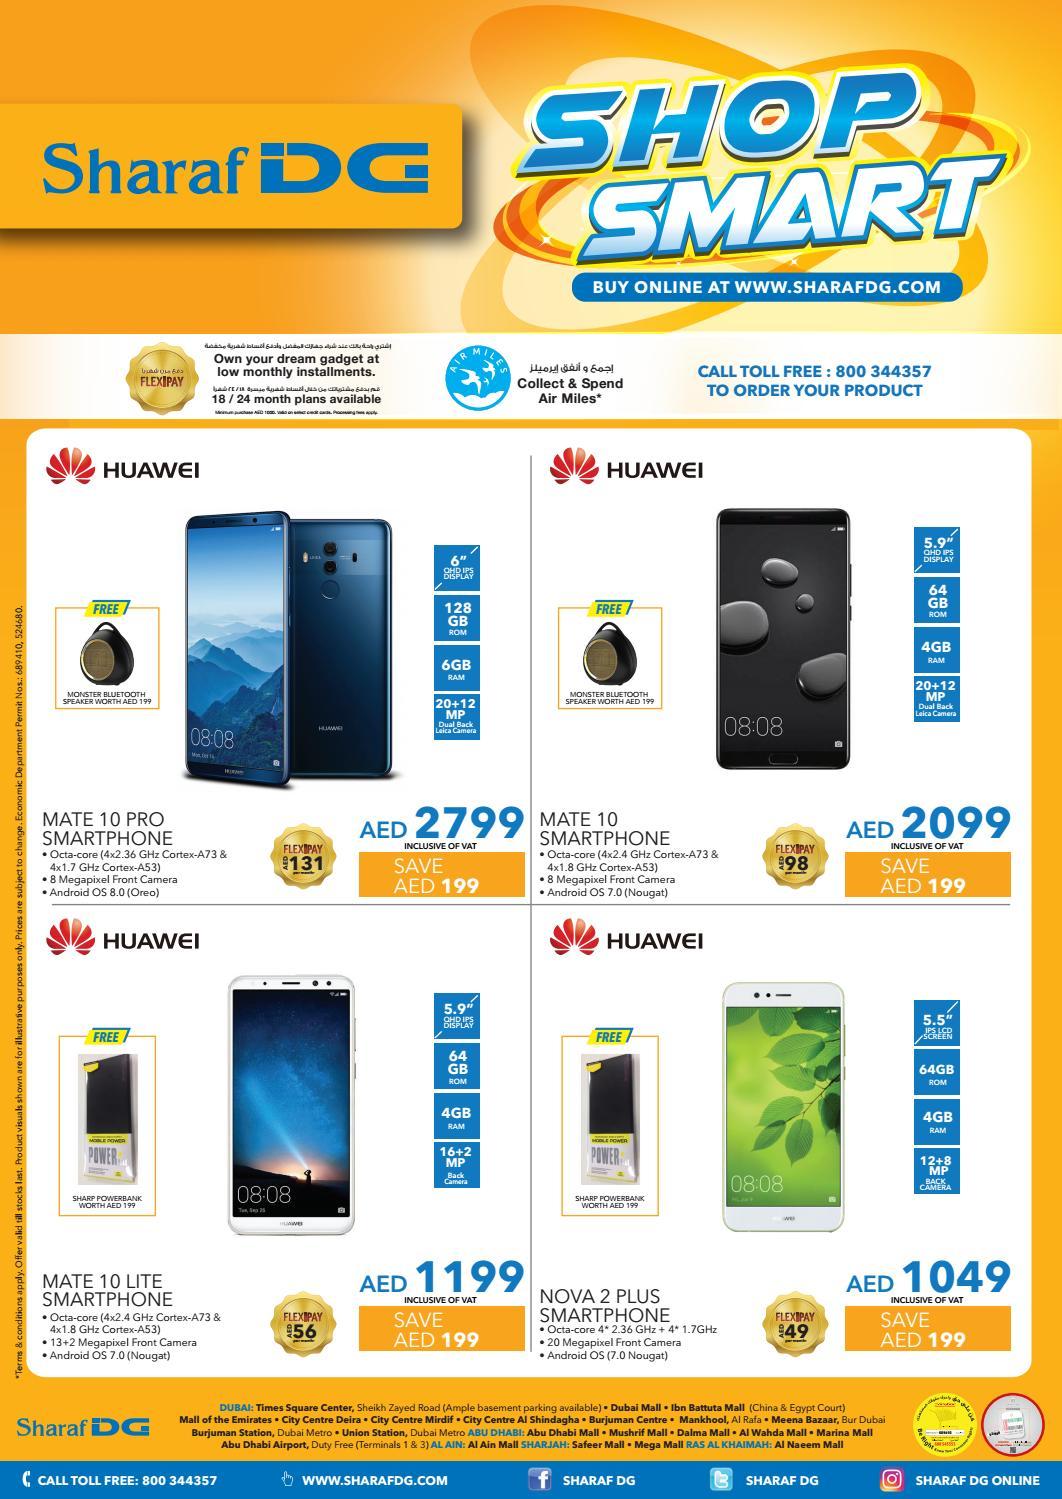 Sharafdg Shop Smart Mobile Offers Sharafdg Promotions